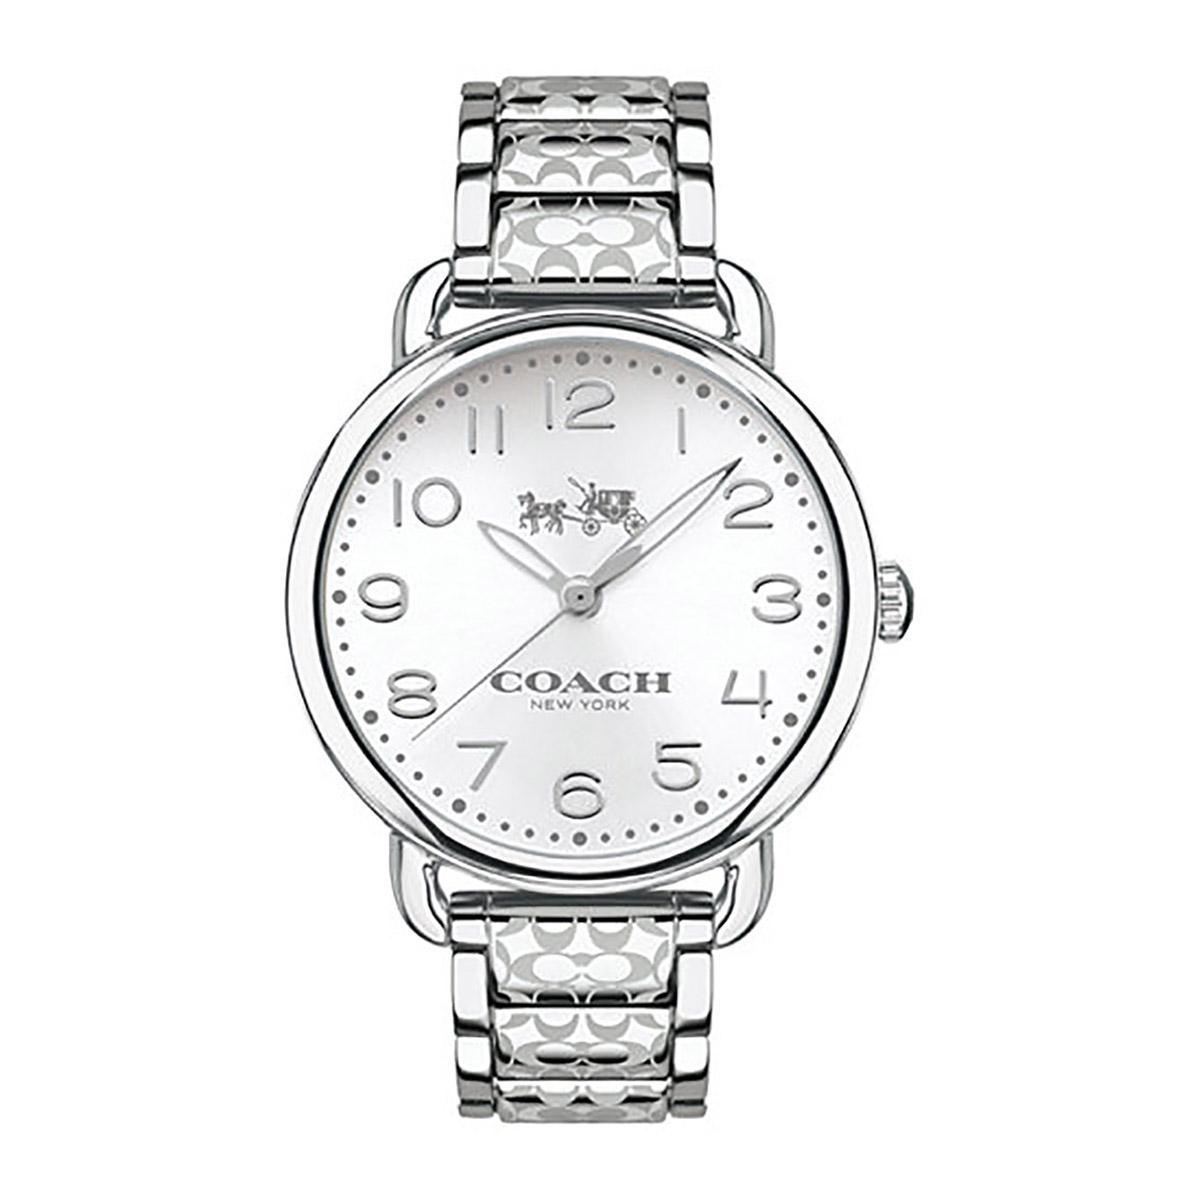 Sale Coach Watch Delancey Silver Stainless Steel Case Stainless Steel Bracelet Ladies 14502495 Coach